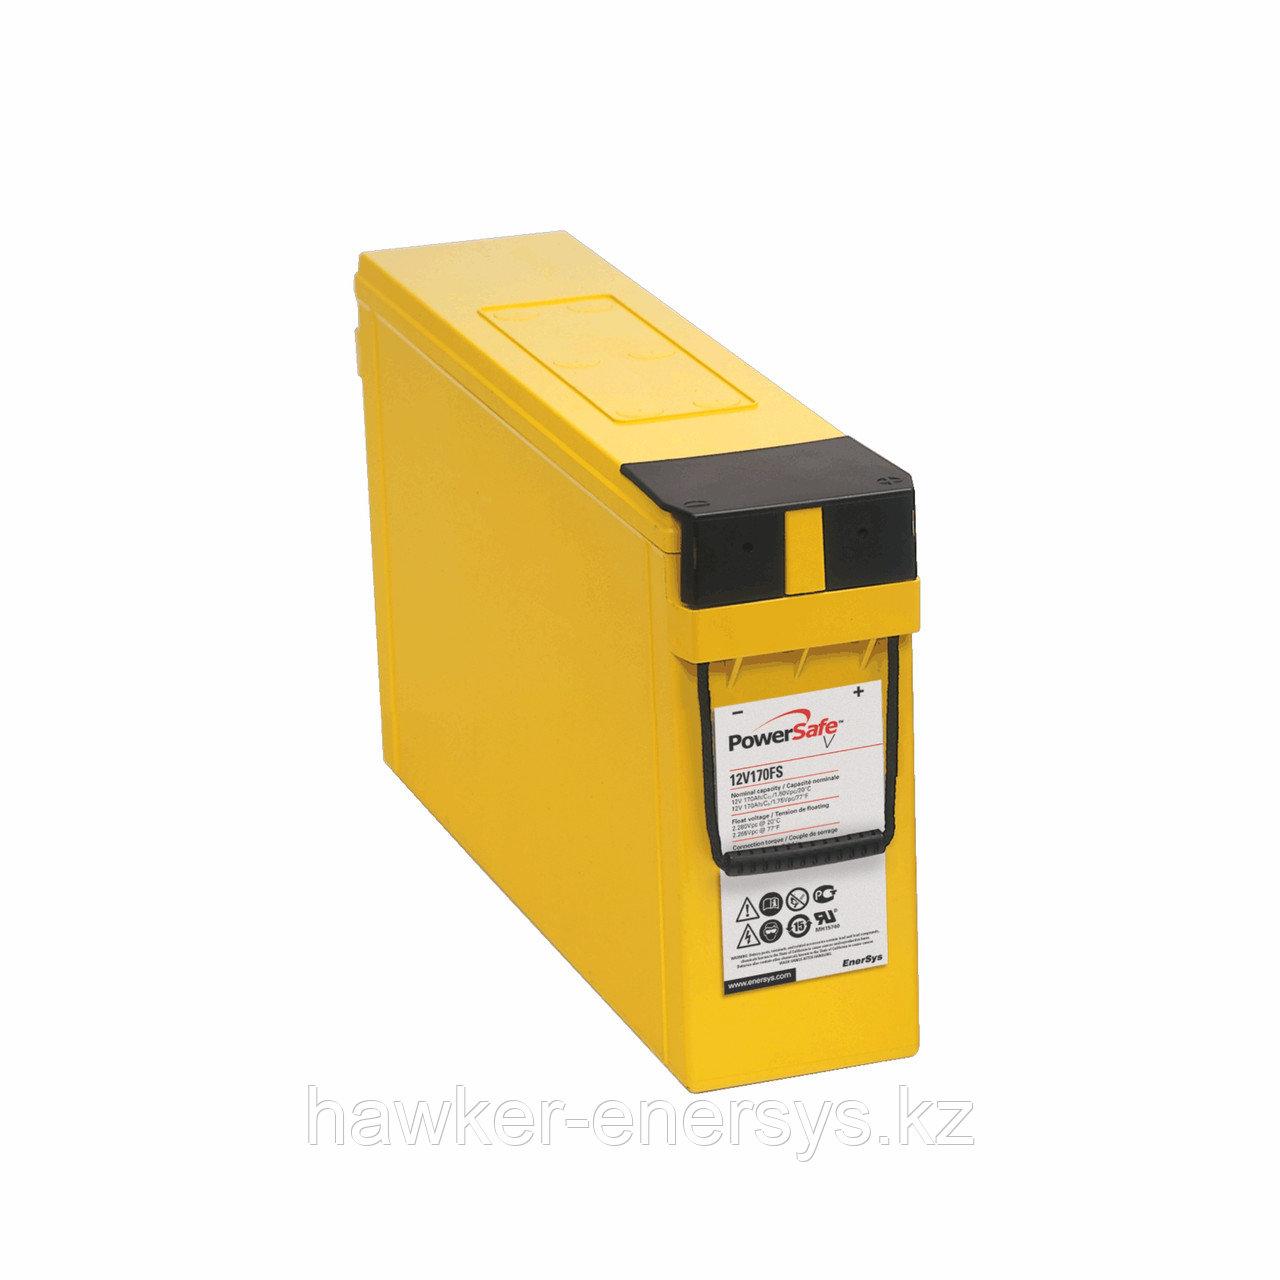 Аккумуляторная батарея PowerSafe 12V170FS (170AH)